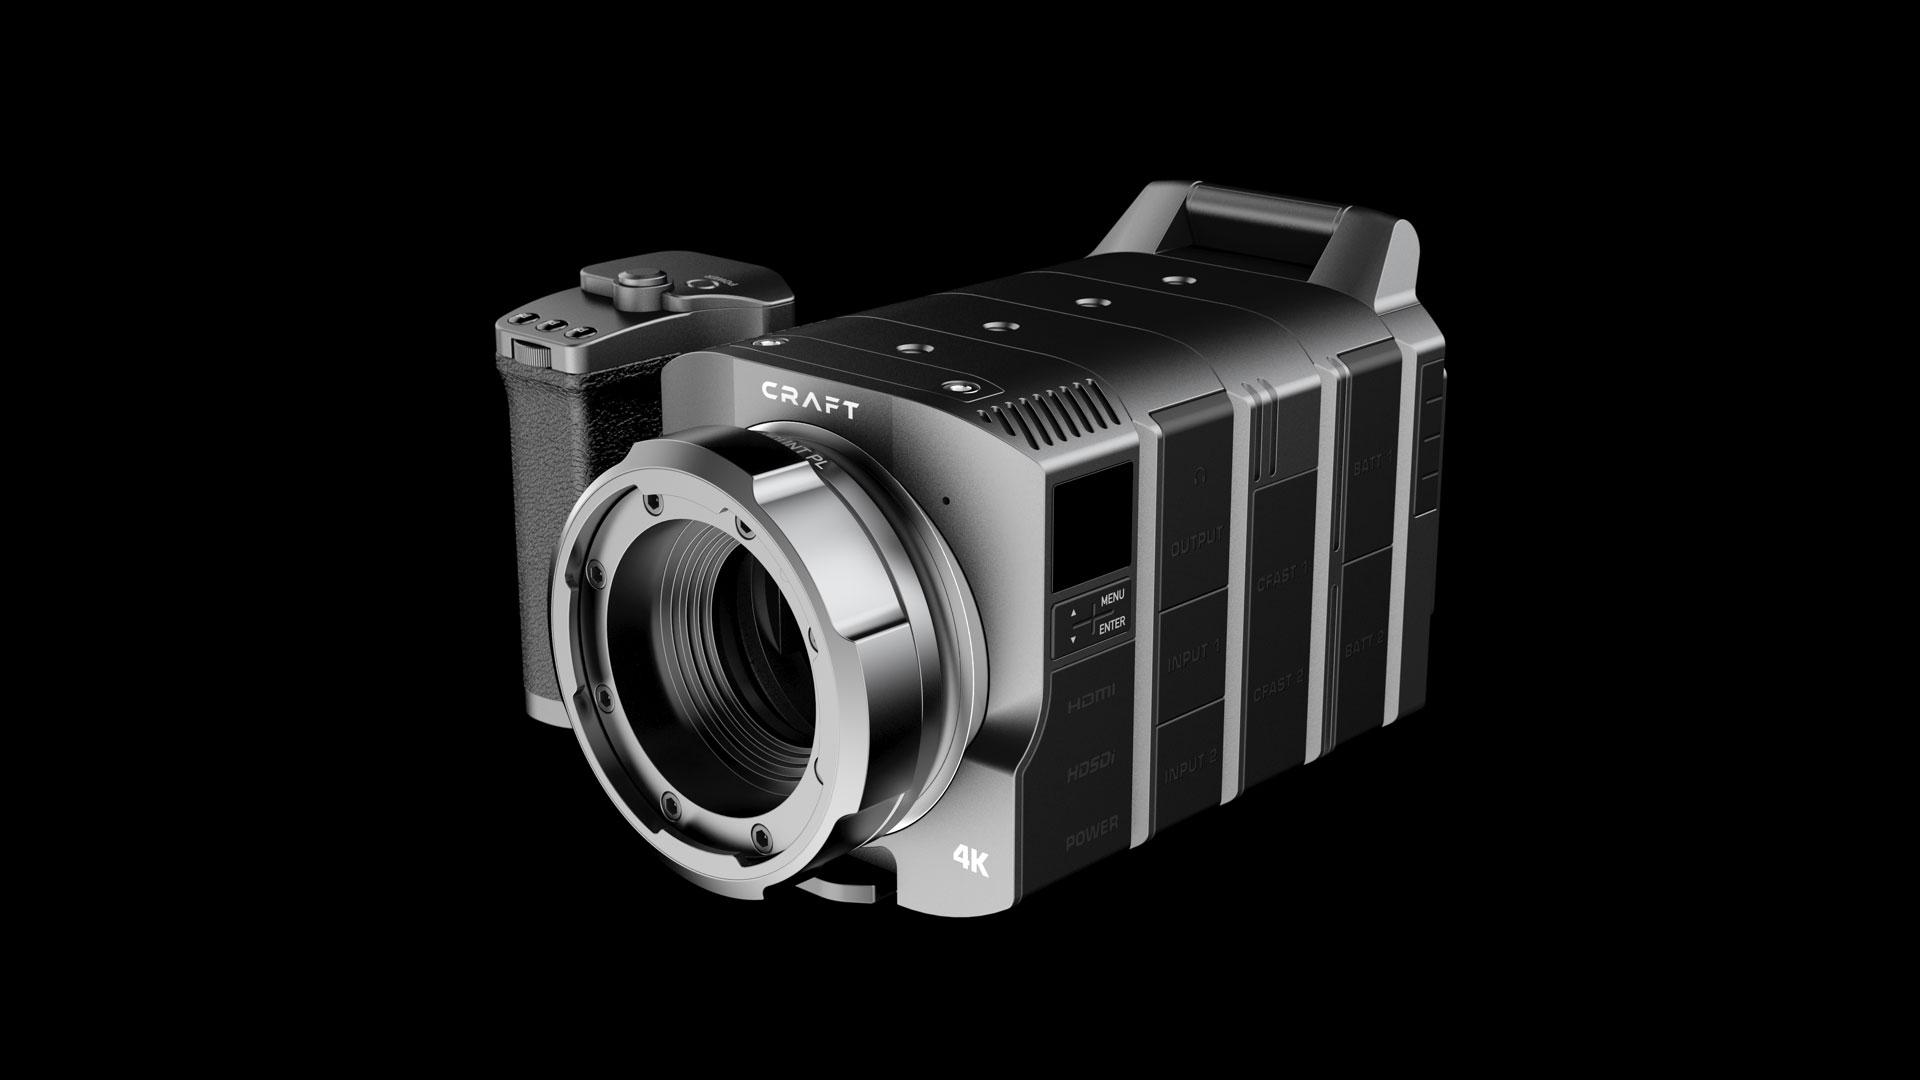 craft-camera-2.jpg